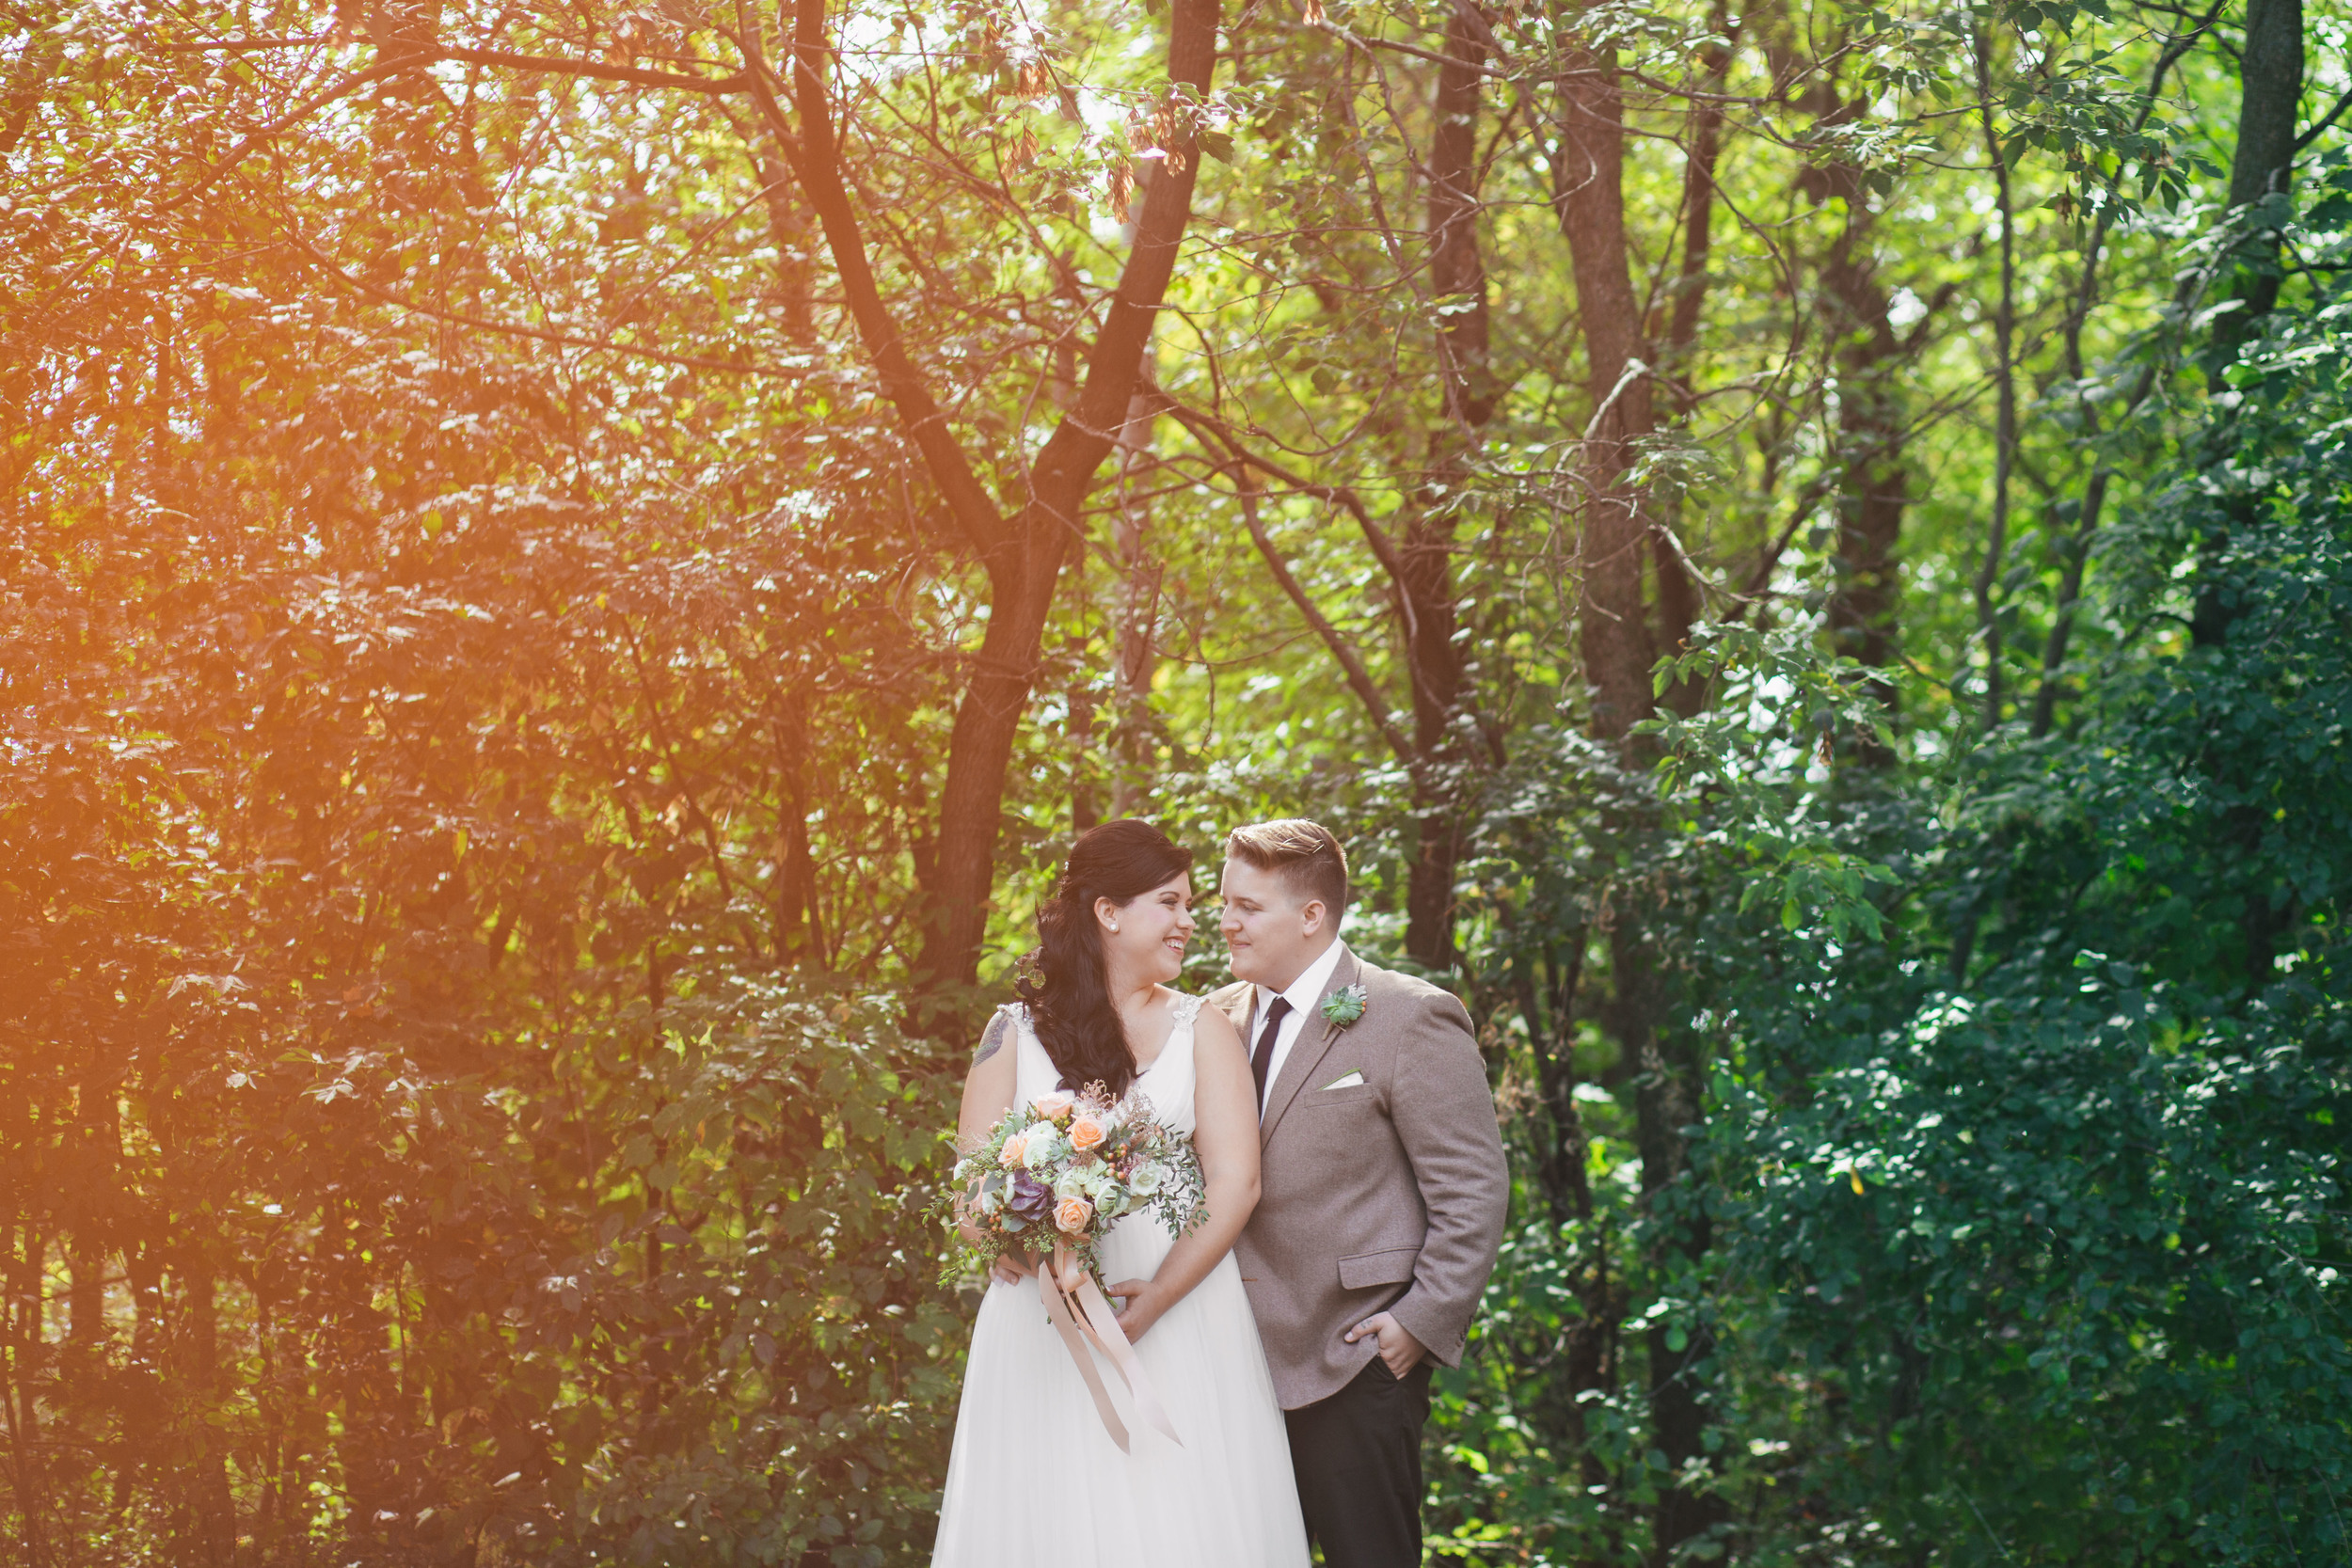 Minnesota Wedding Brandon & Phoebe (1 of 1).jpg